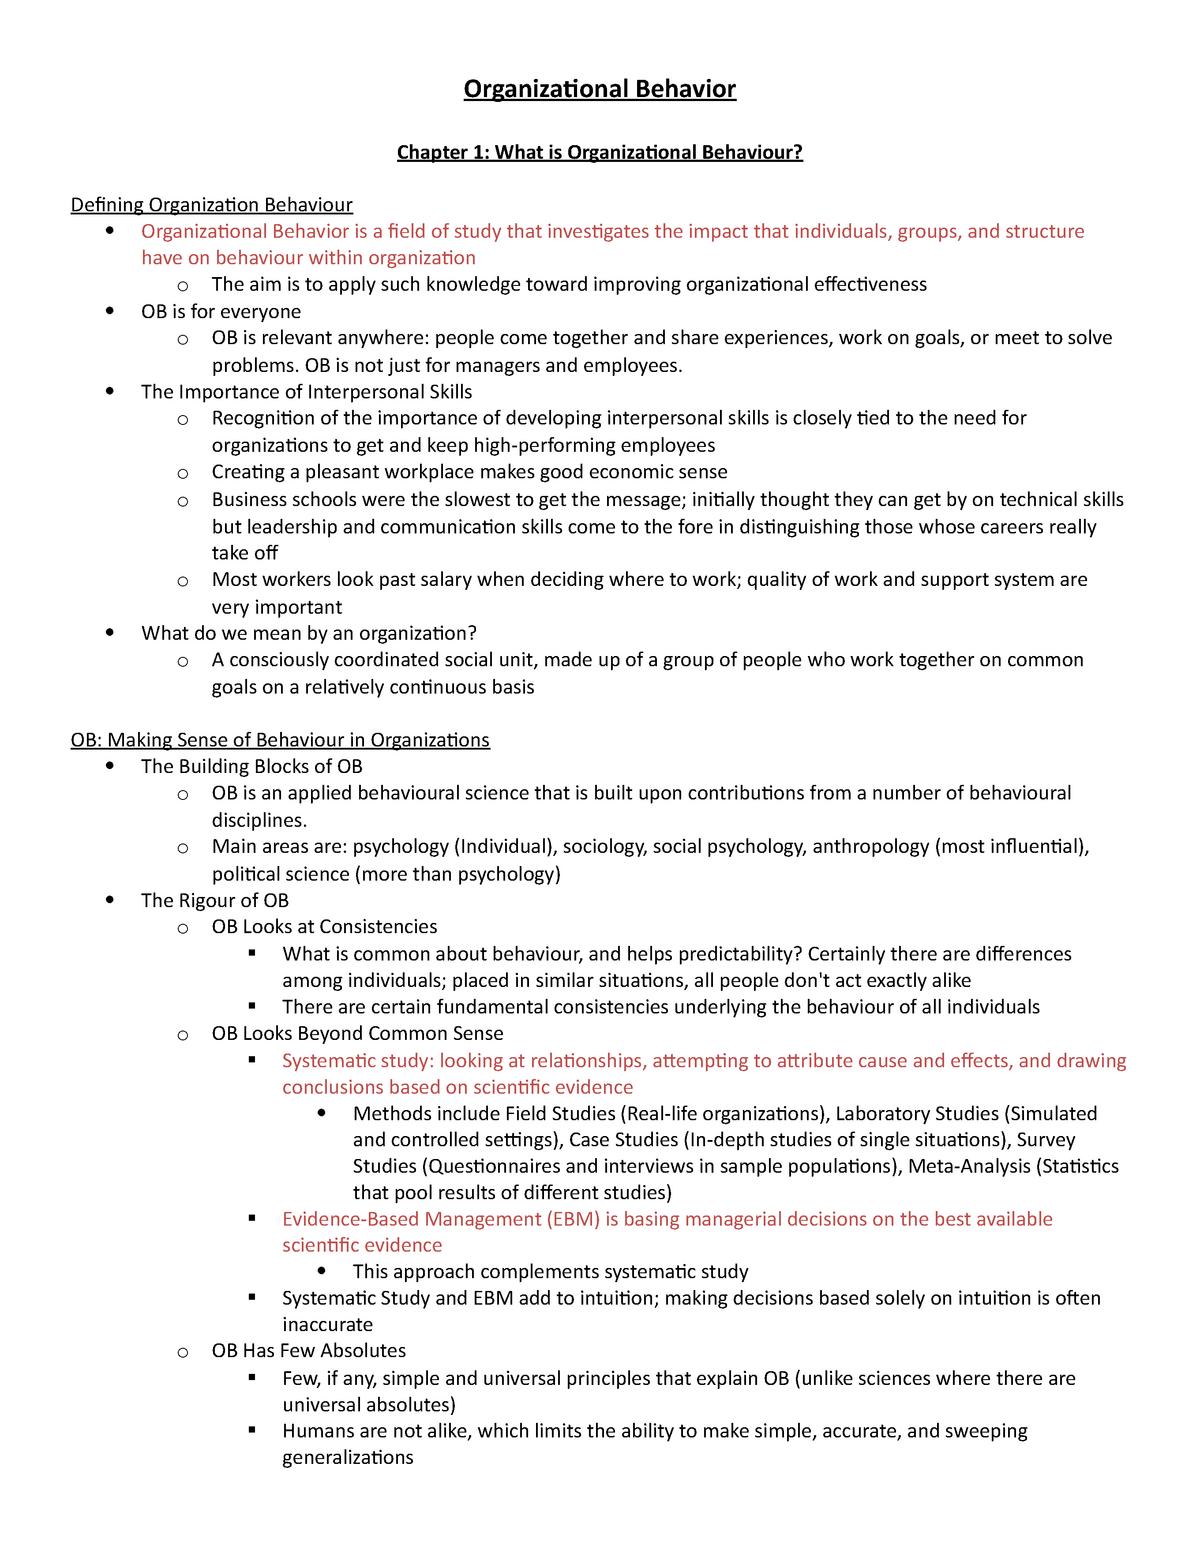 Chapter-Notes - Msci 211 Organizational Behaviour - StuDocu